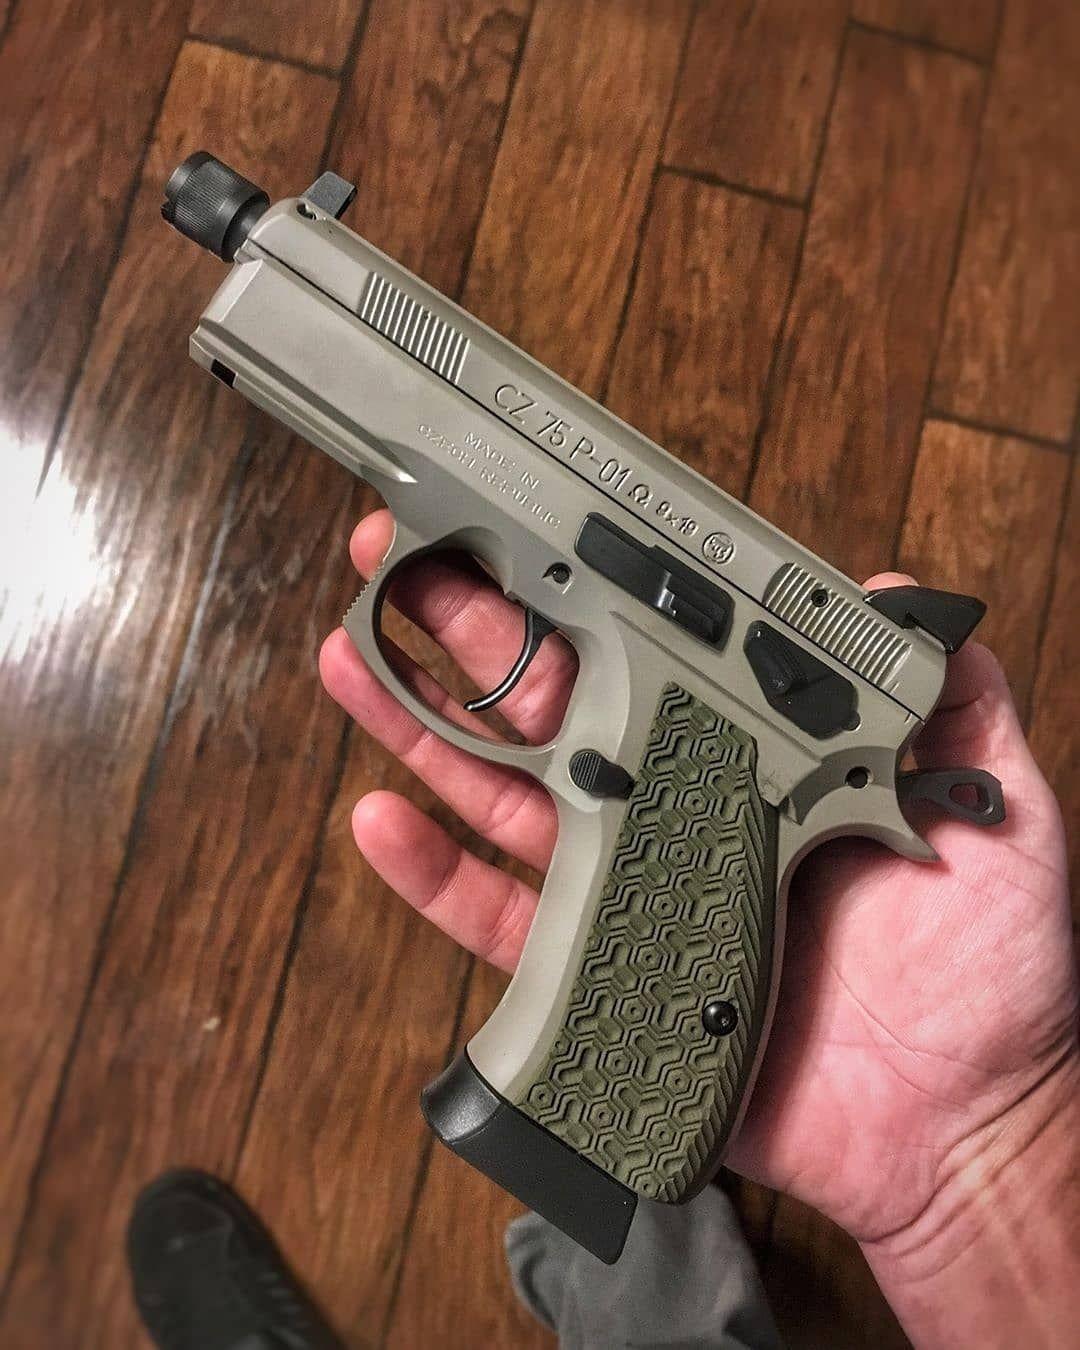 Pin by Couture Cuisine LLC on Big Boyz toyz | Guns, Hand guns